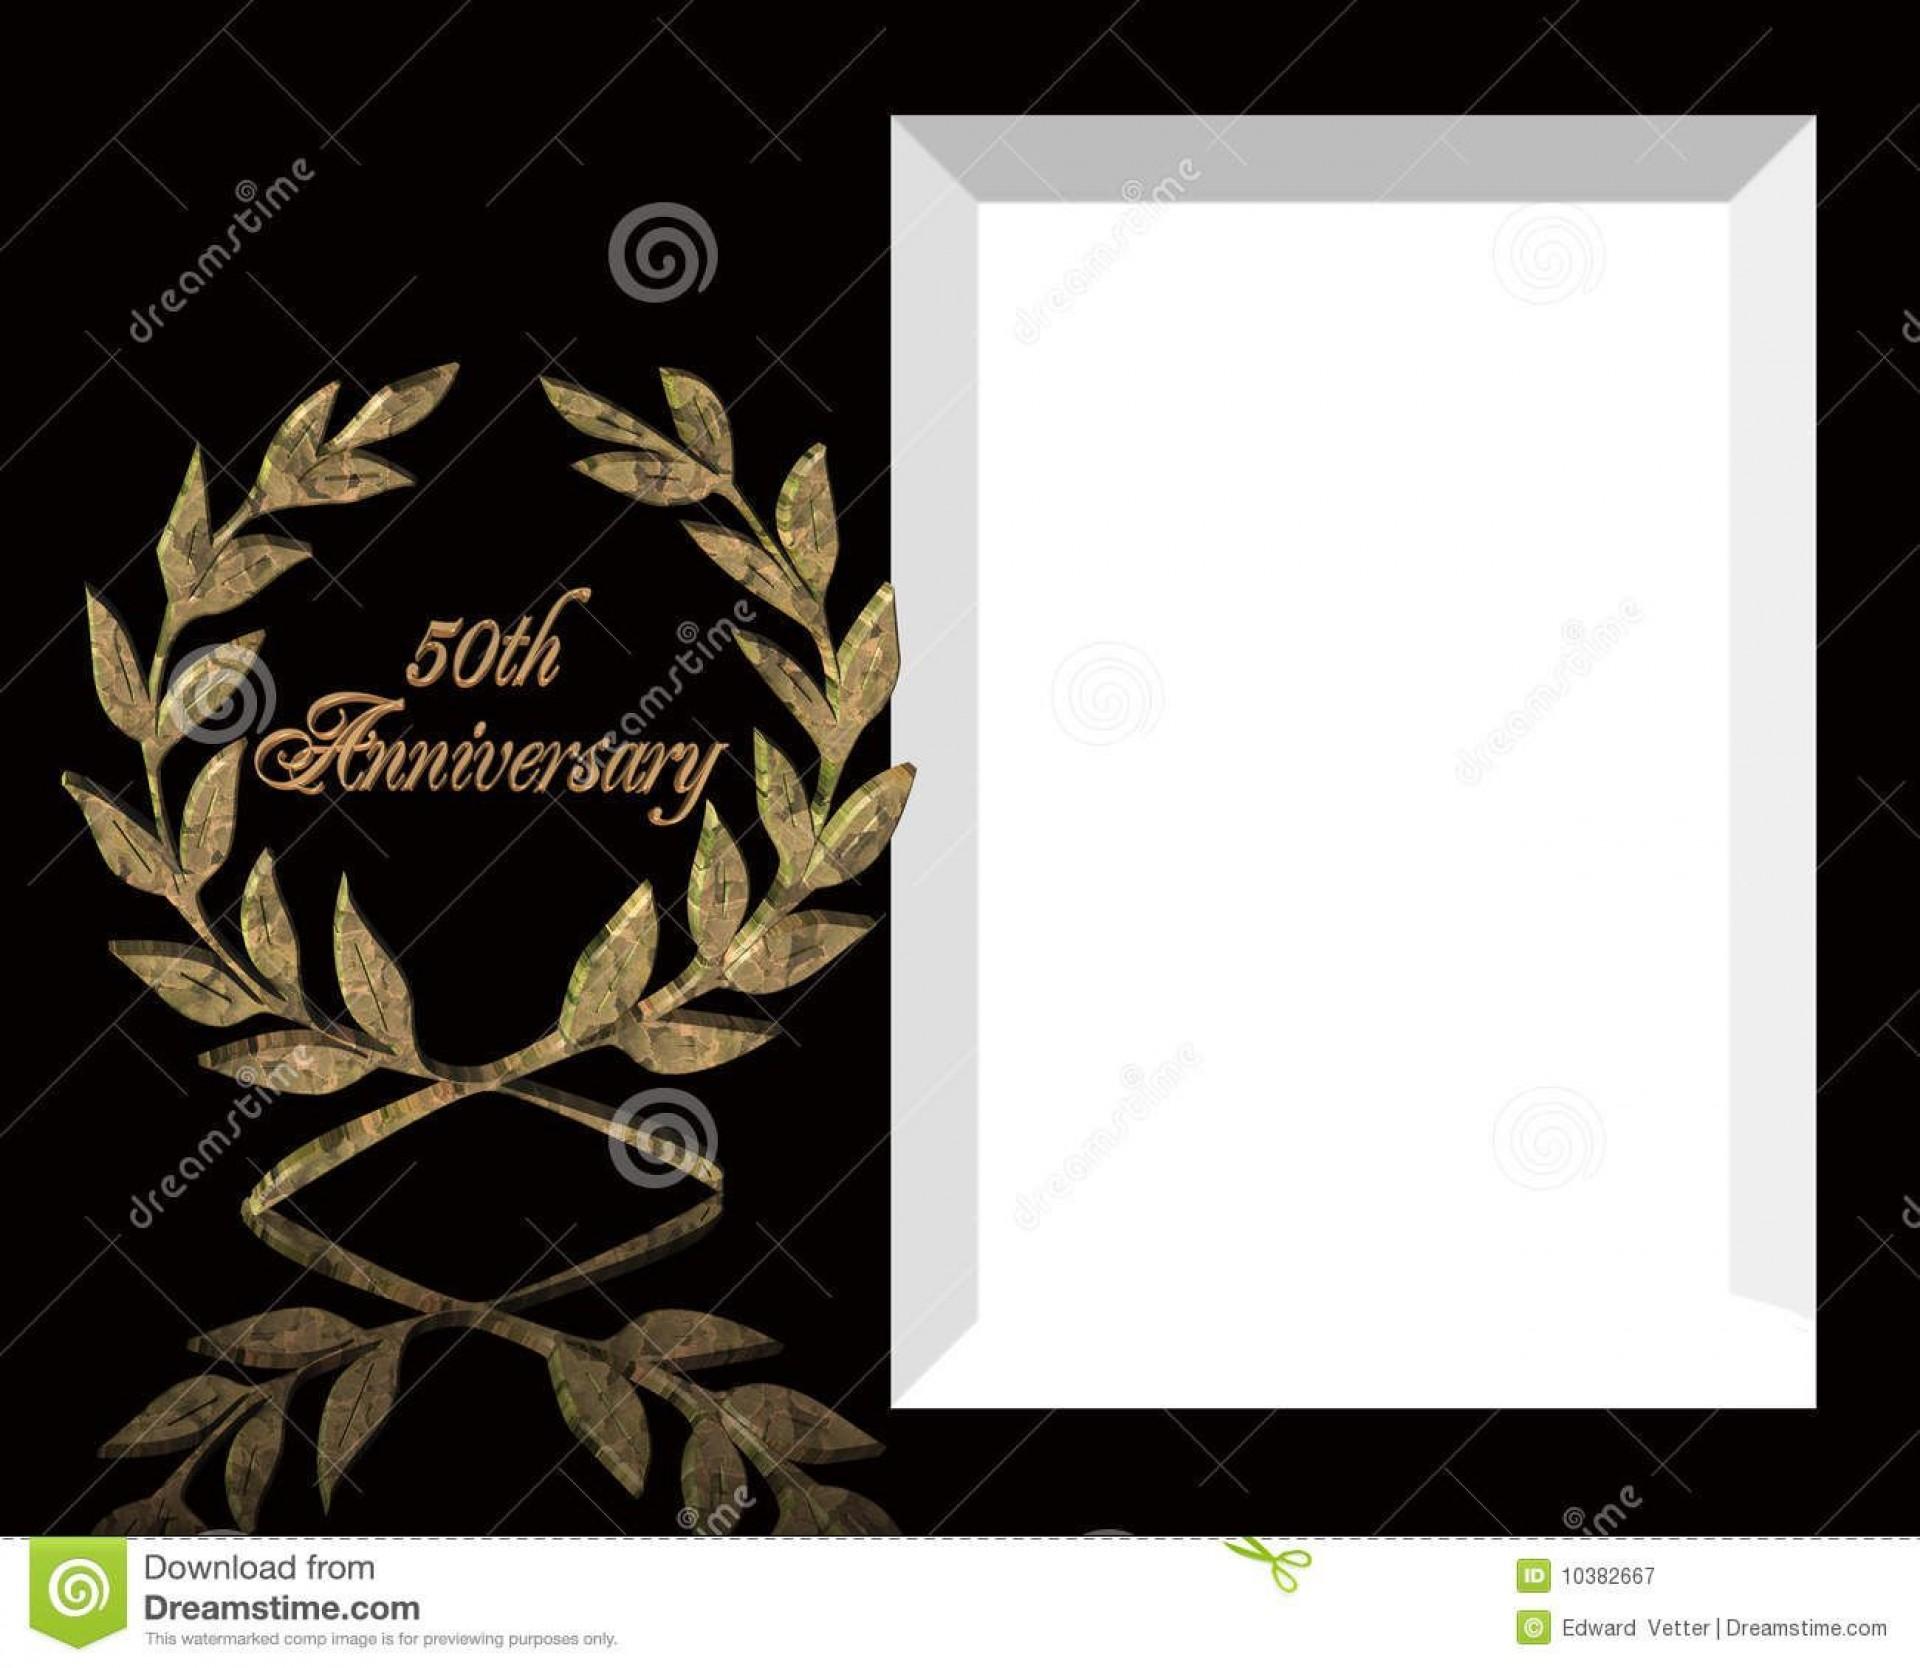 005 Beautiful 50th Anniversary Party Invitation Template Inspiration  Templates Golden Wedding Uk Microsoft Word Free1920